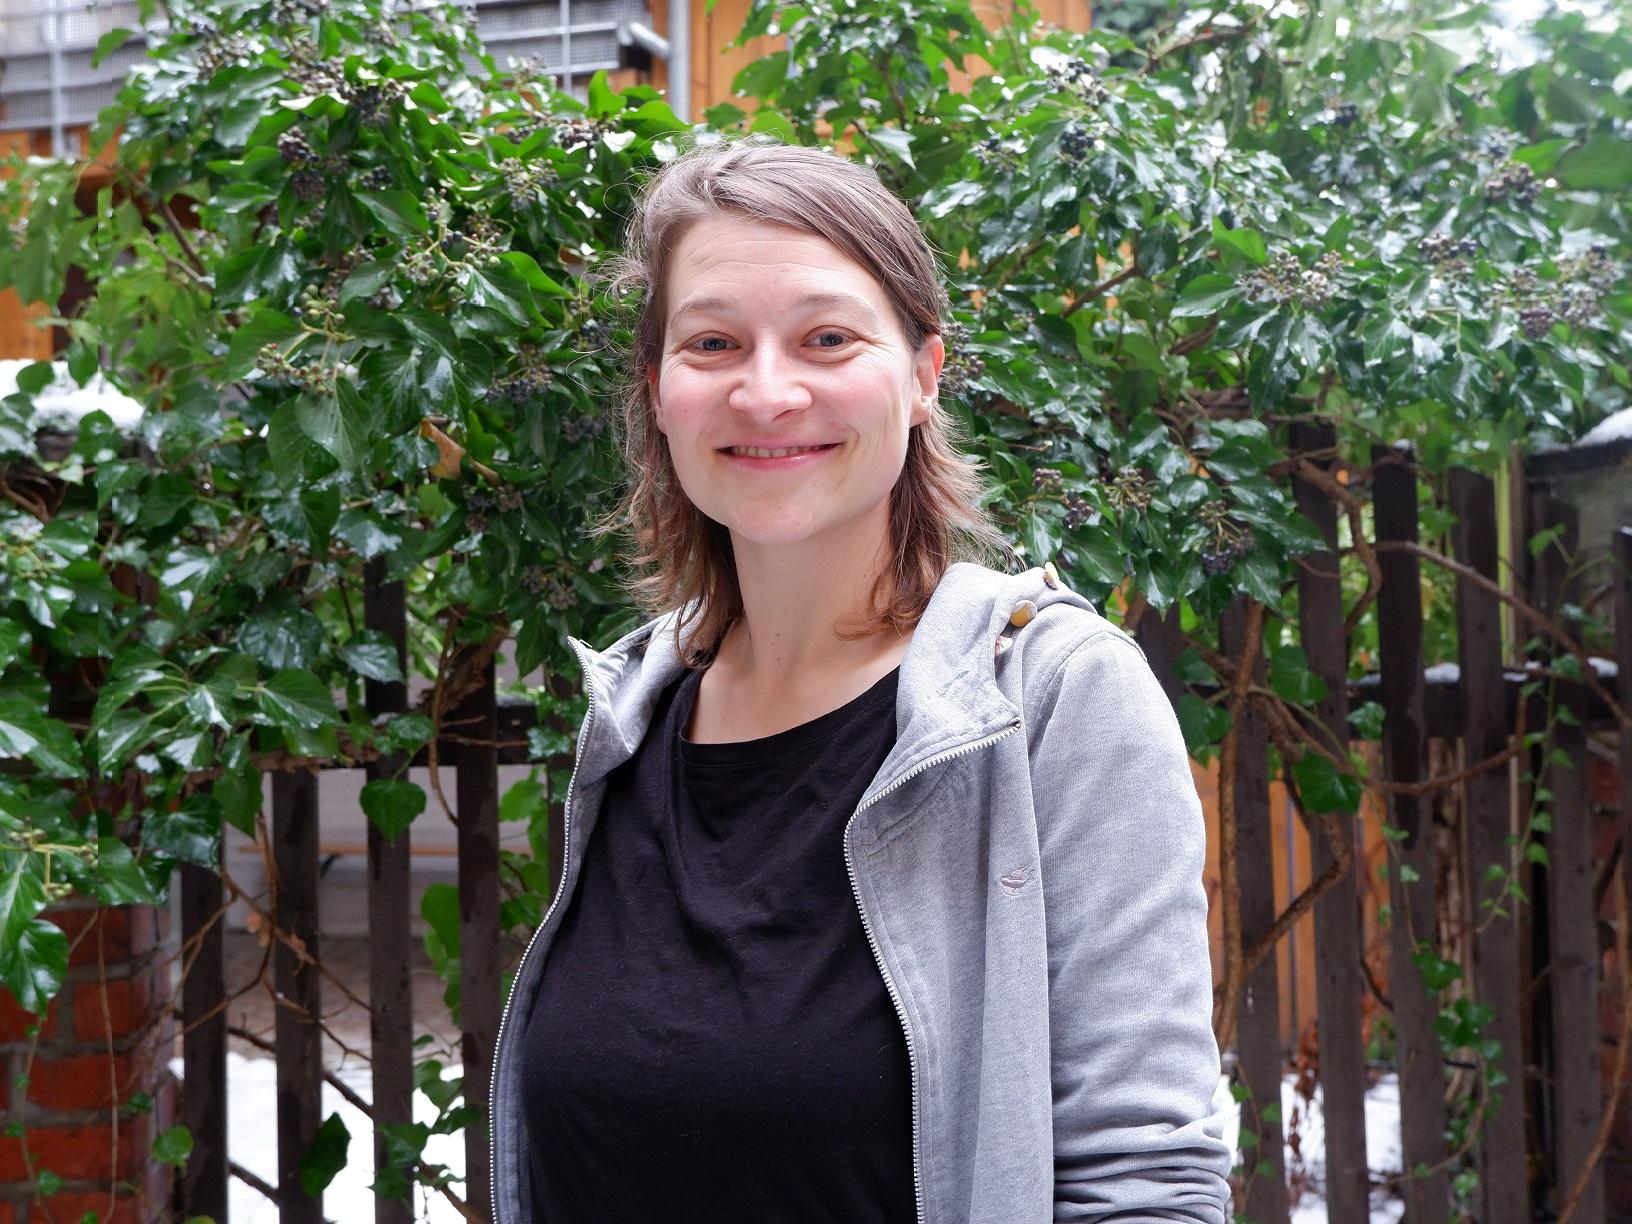 Johanna Görcke